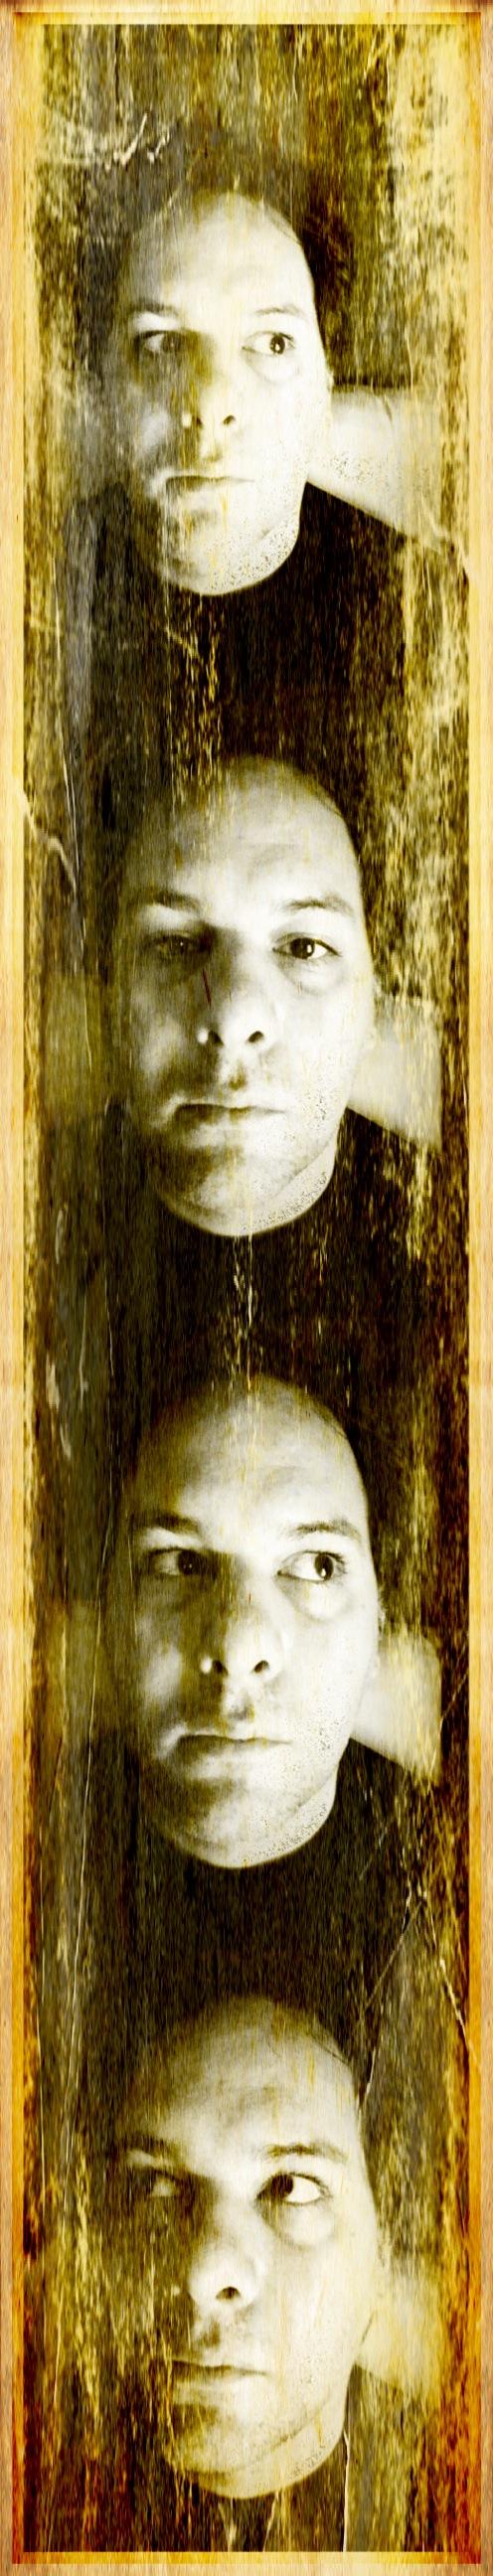 Photostrip self portrait